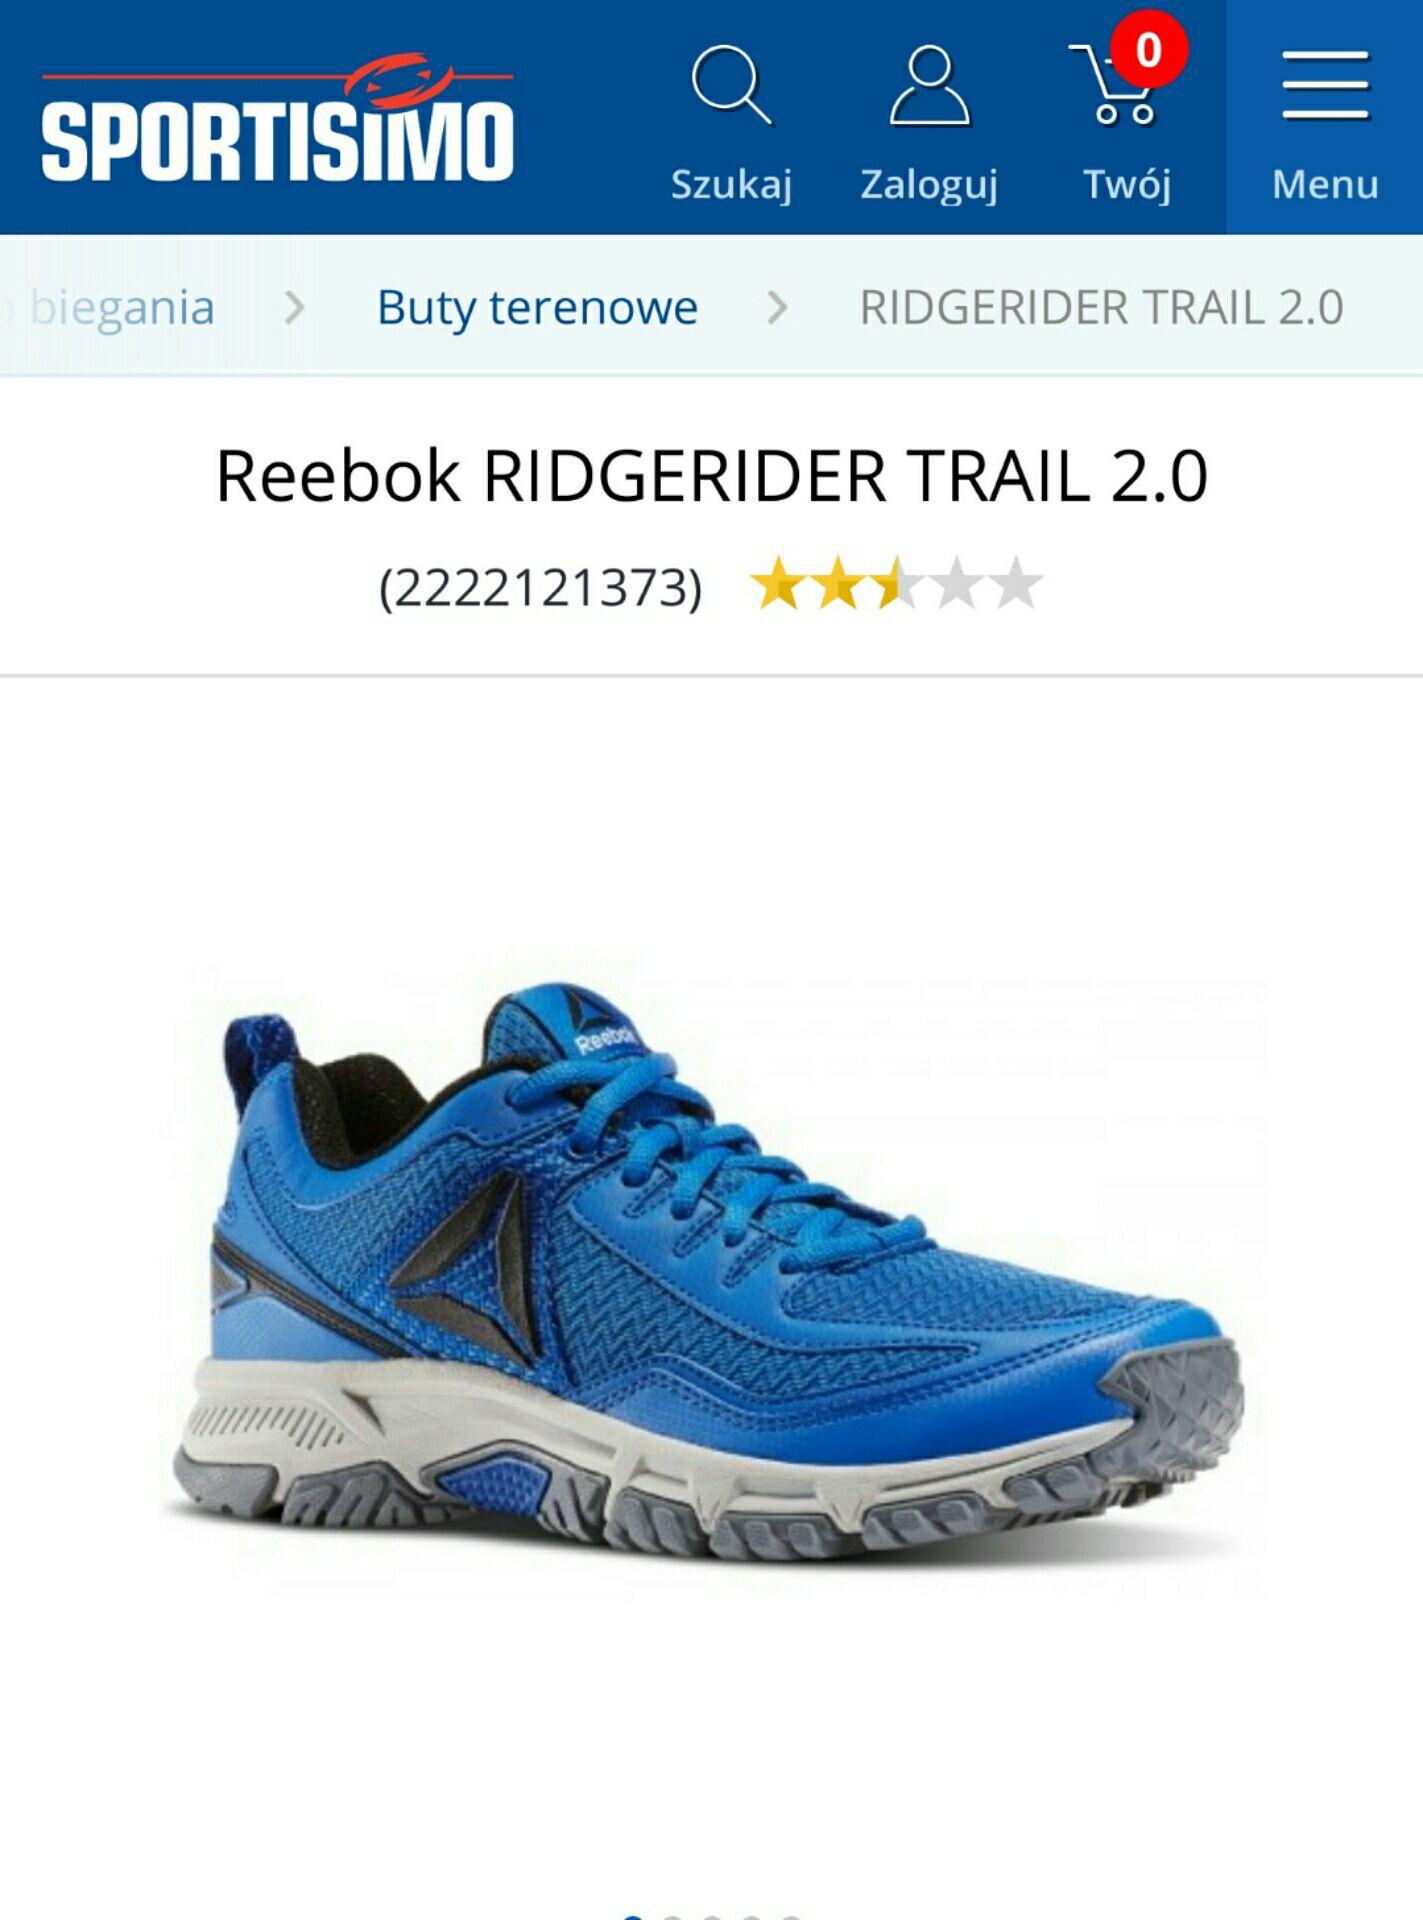 Reebok Ridgerider Trial 2.0